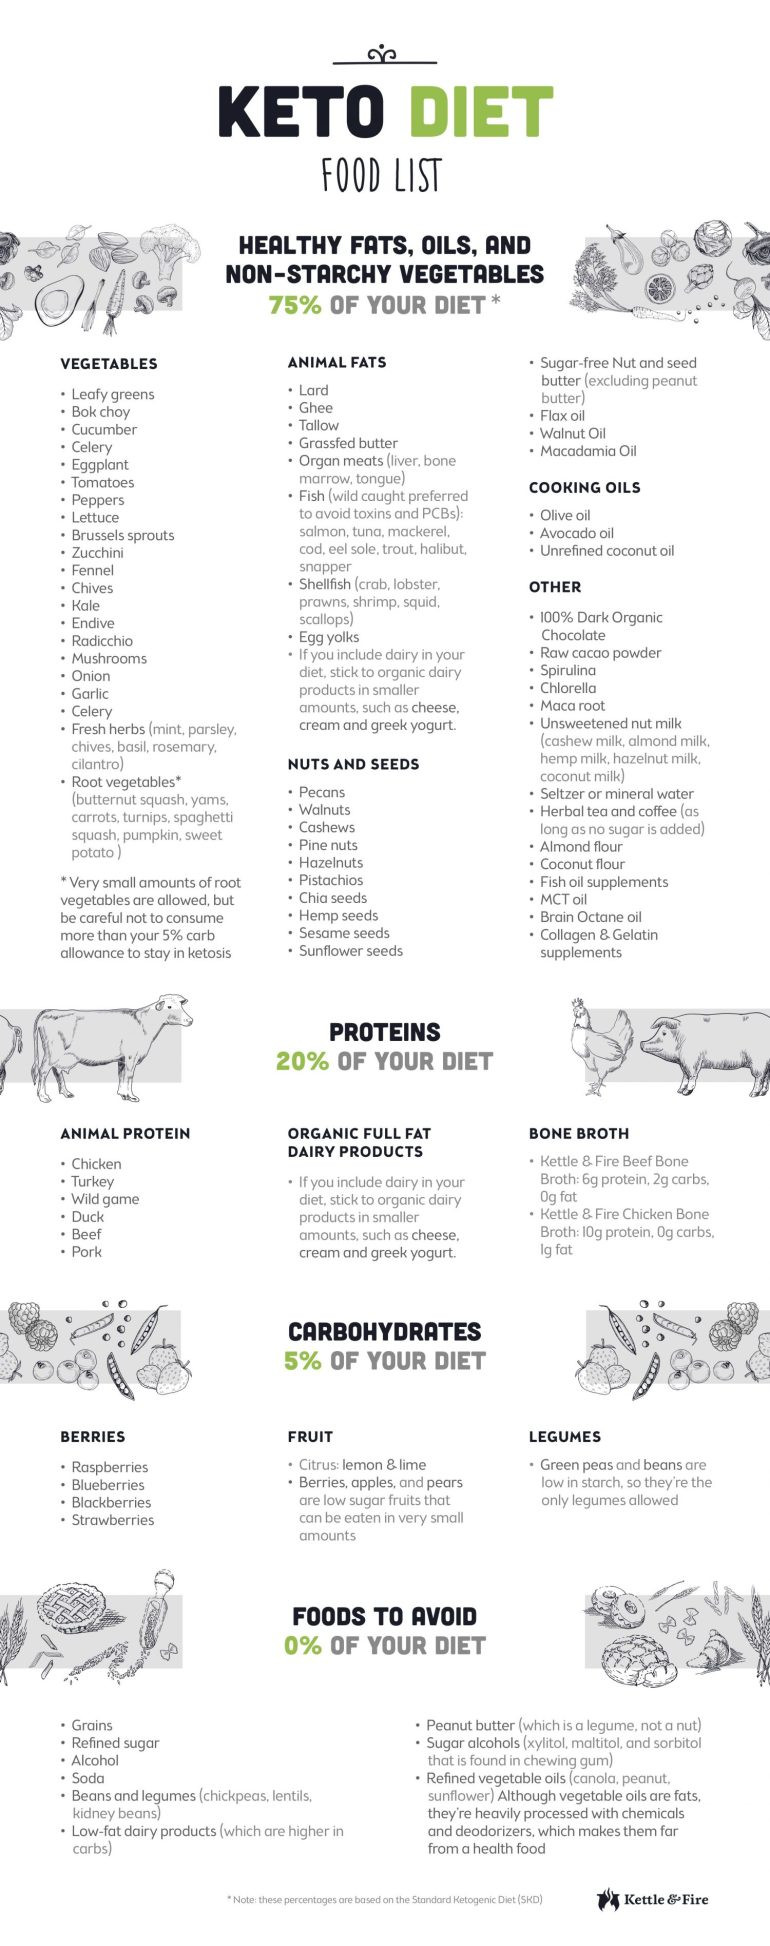 Keto Diet For Beginners Meal Plan Vegetarian  The Ultimate Keto Diet Beginner s Guide & Grocery List